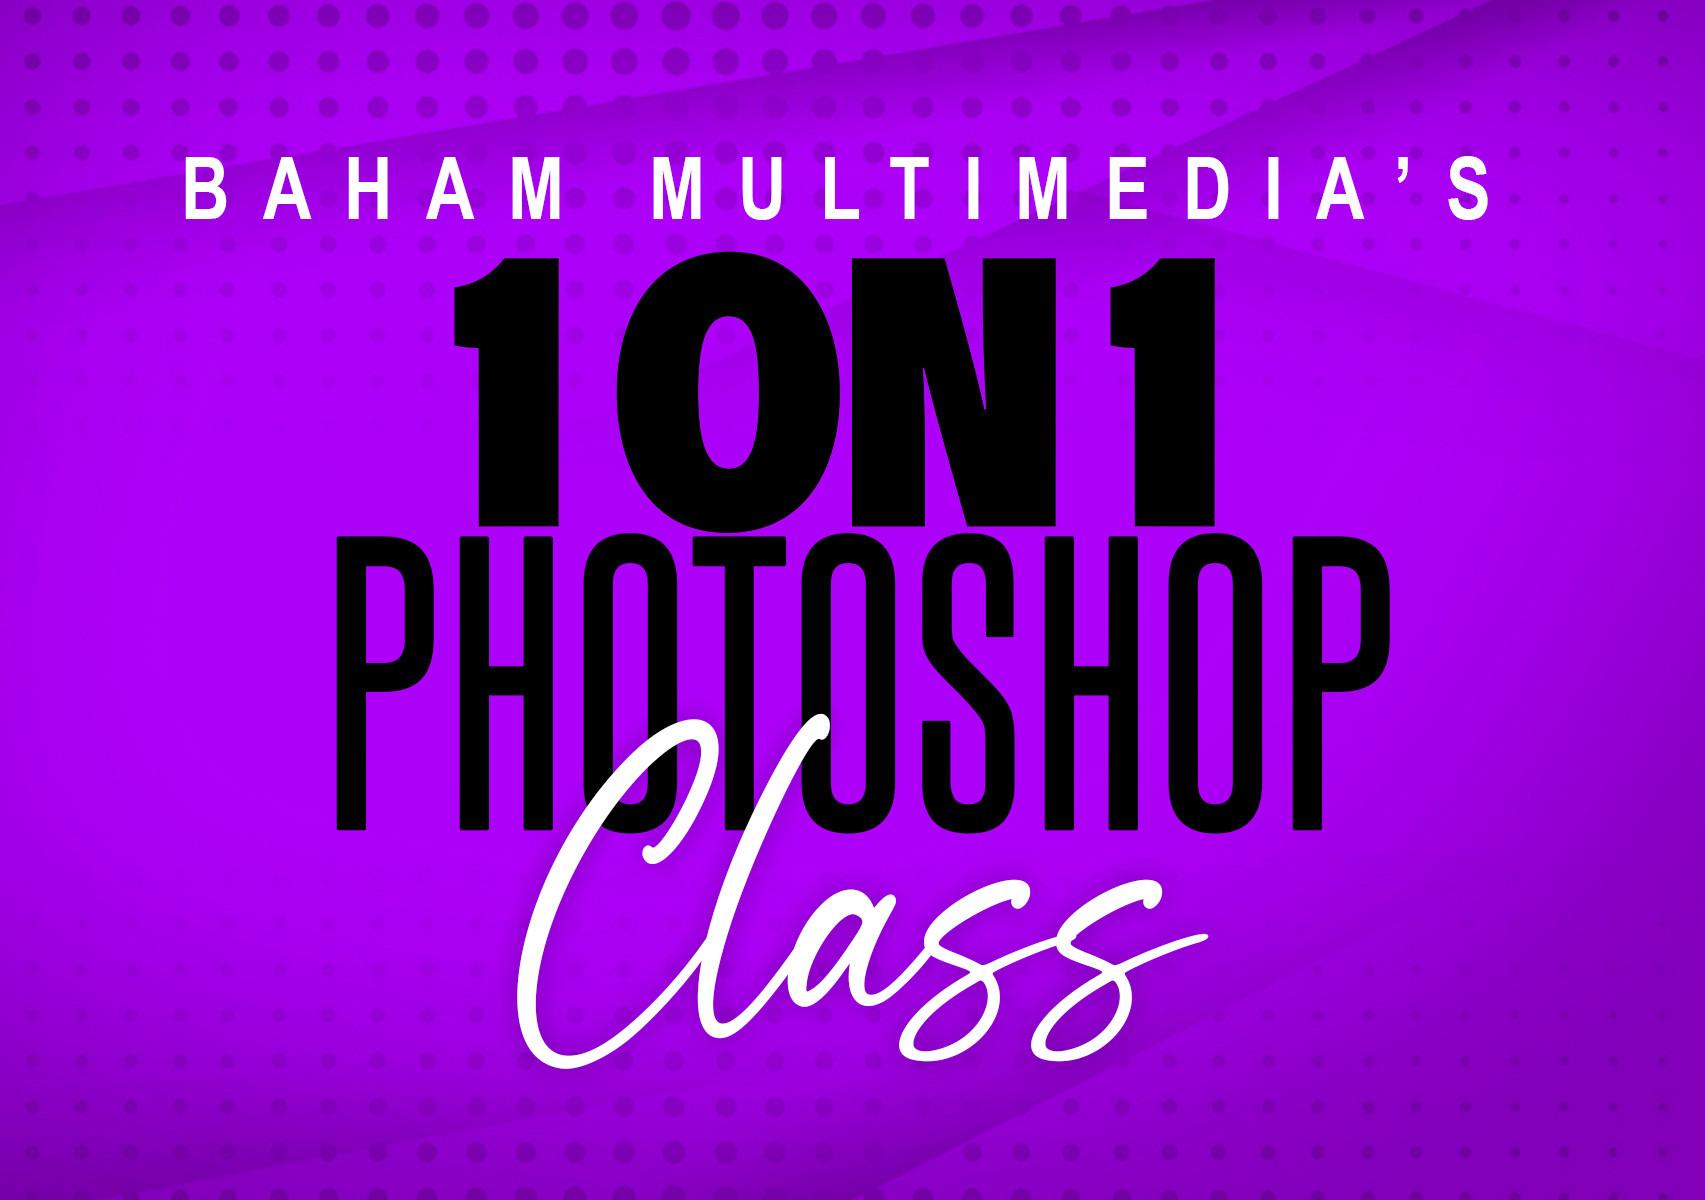 1 on 1 Photoshop Class (90 MINS)